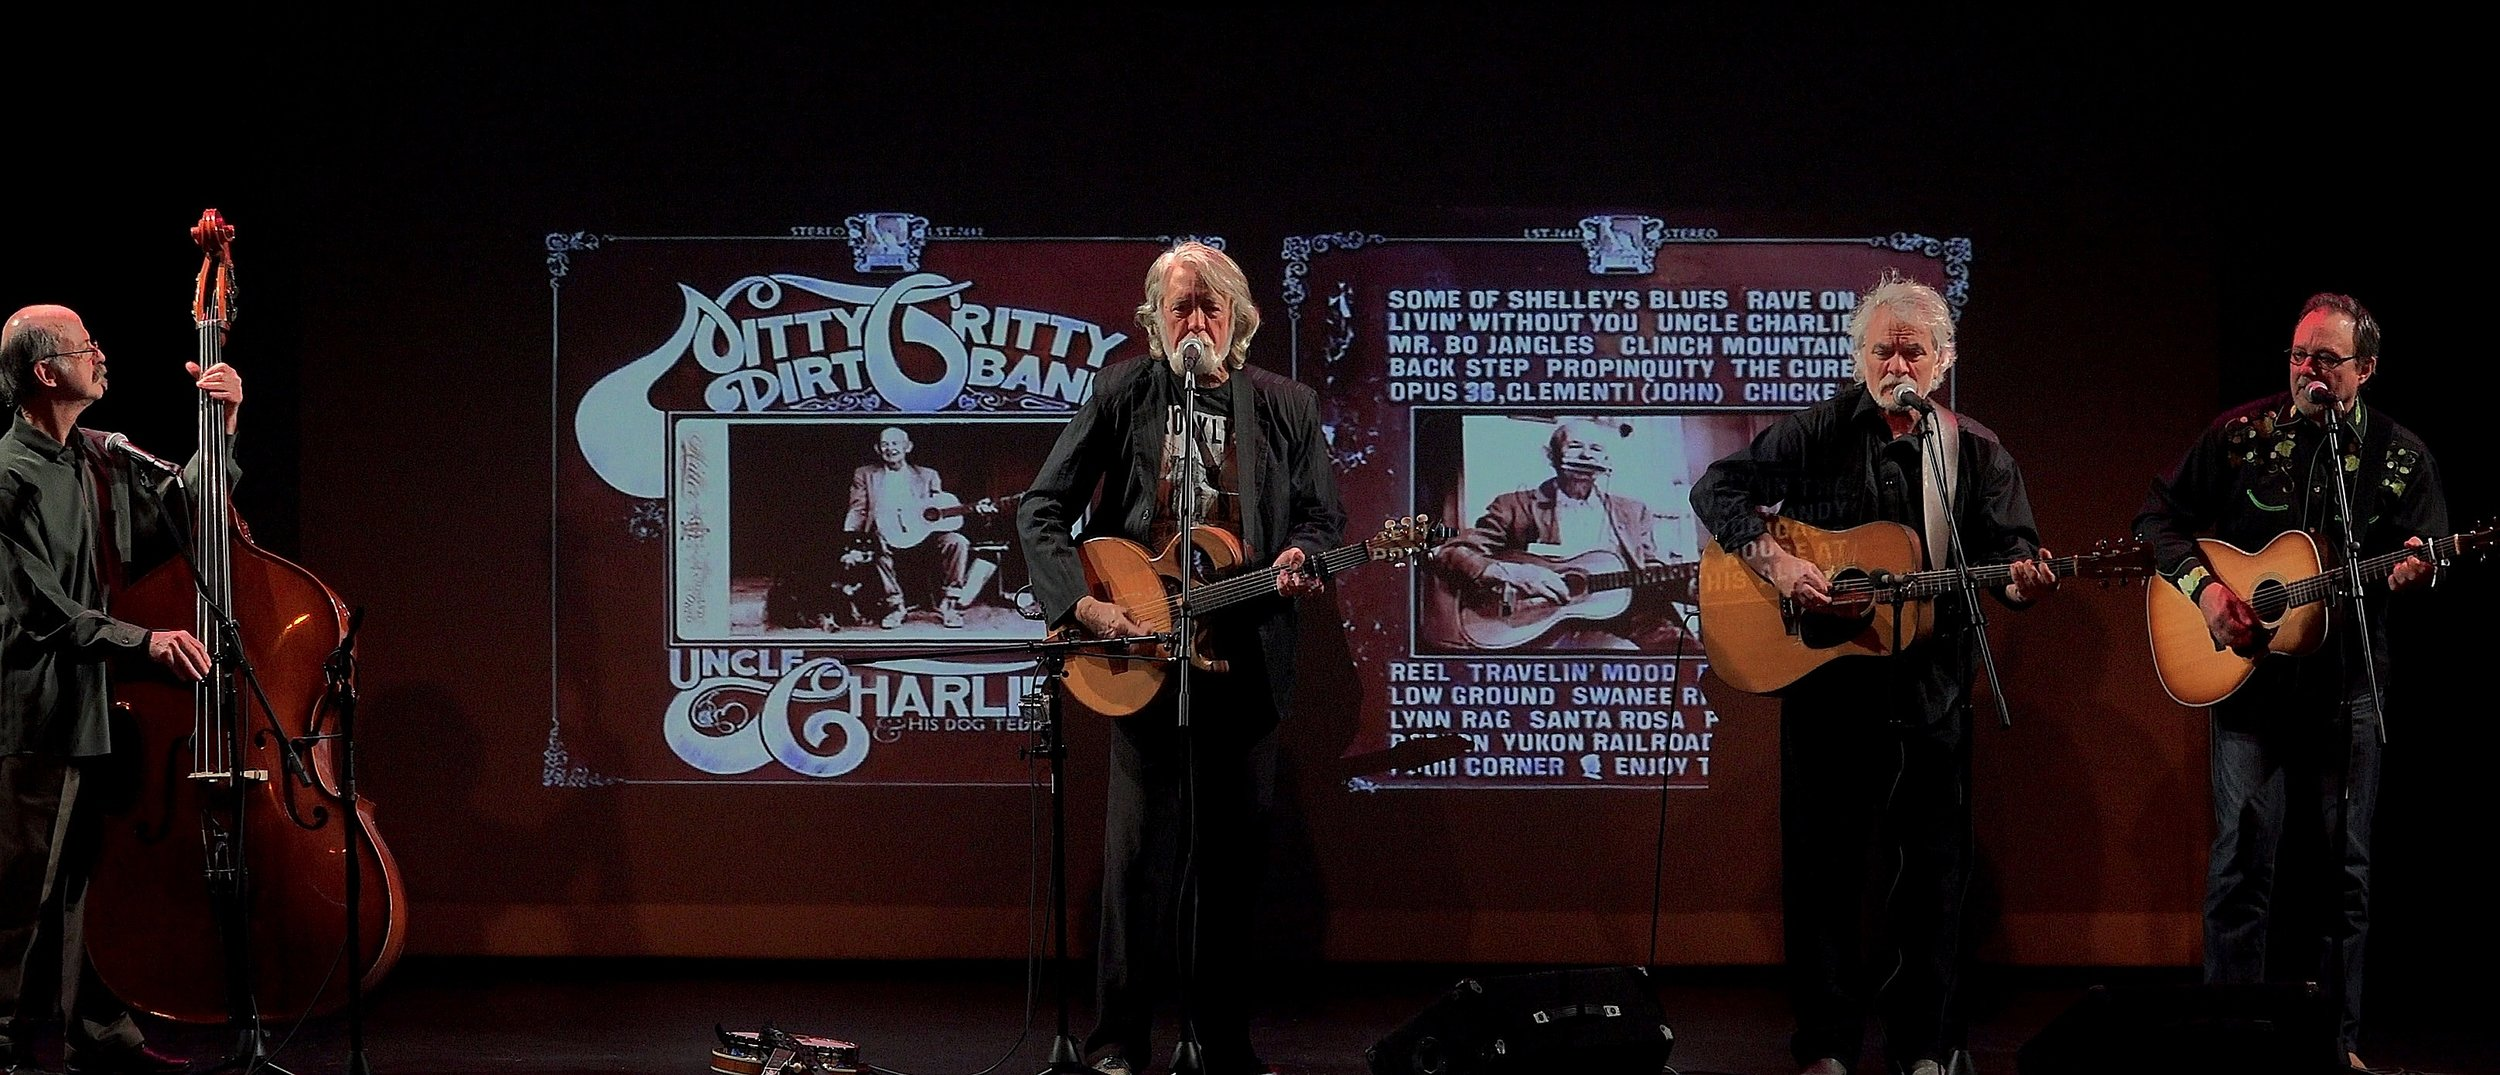 6 John, band, Charlie on screen Image13.jpg